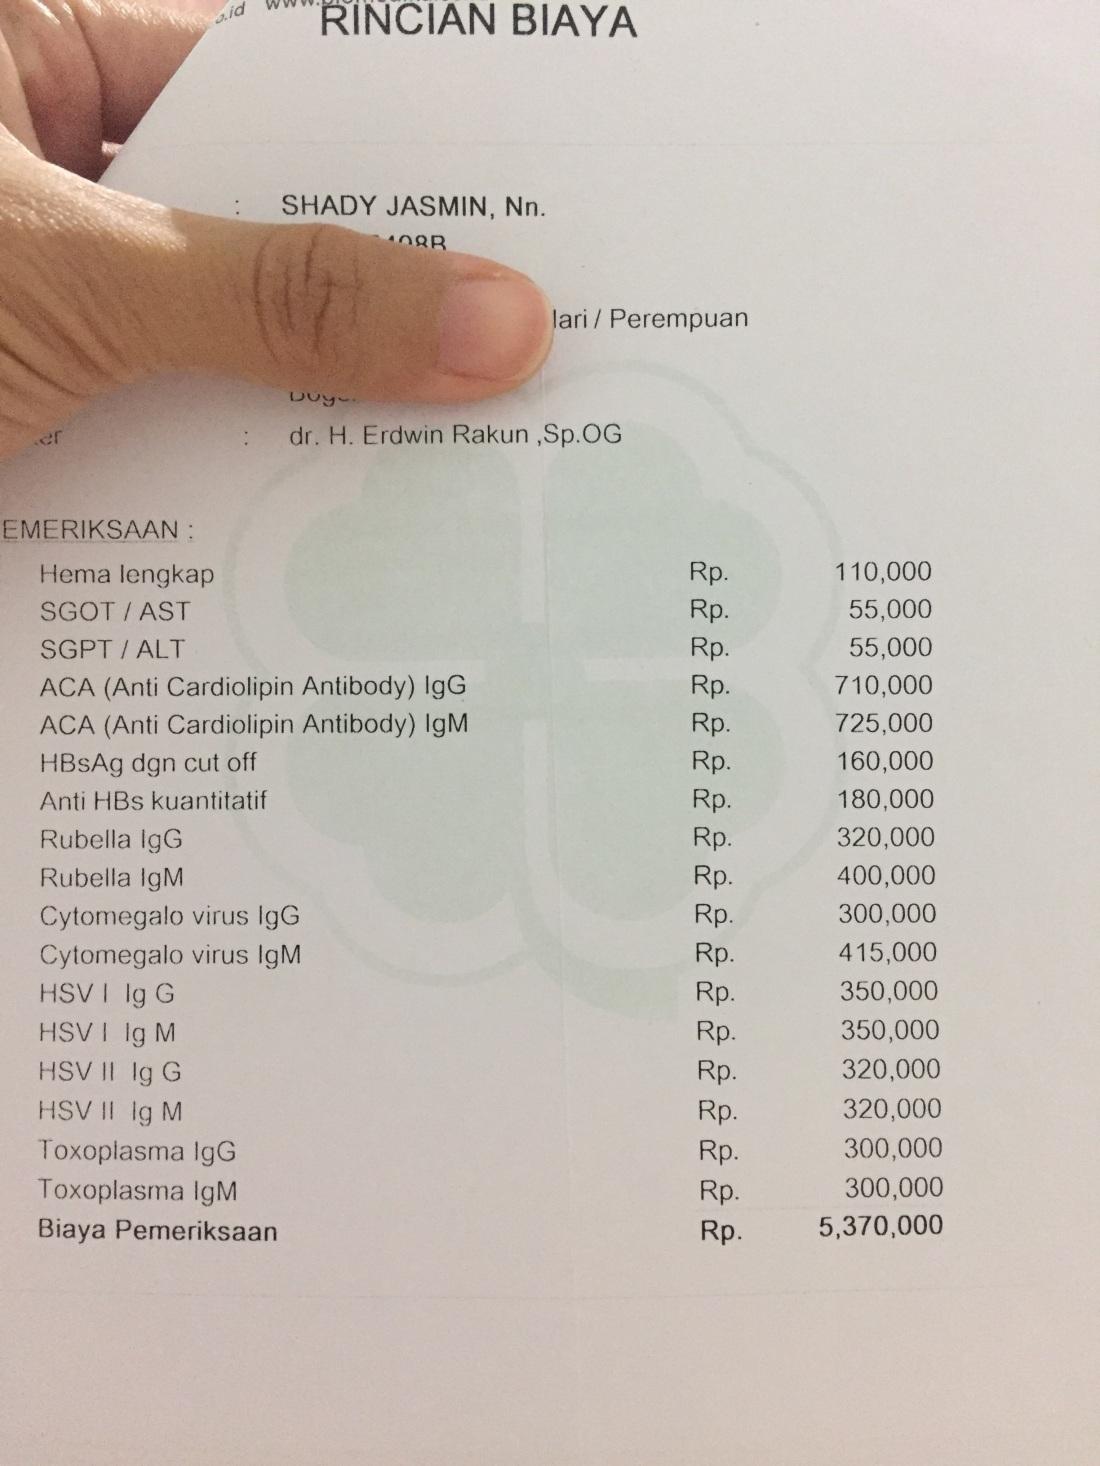 Harga premarital cek up biomedika